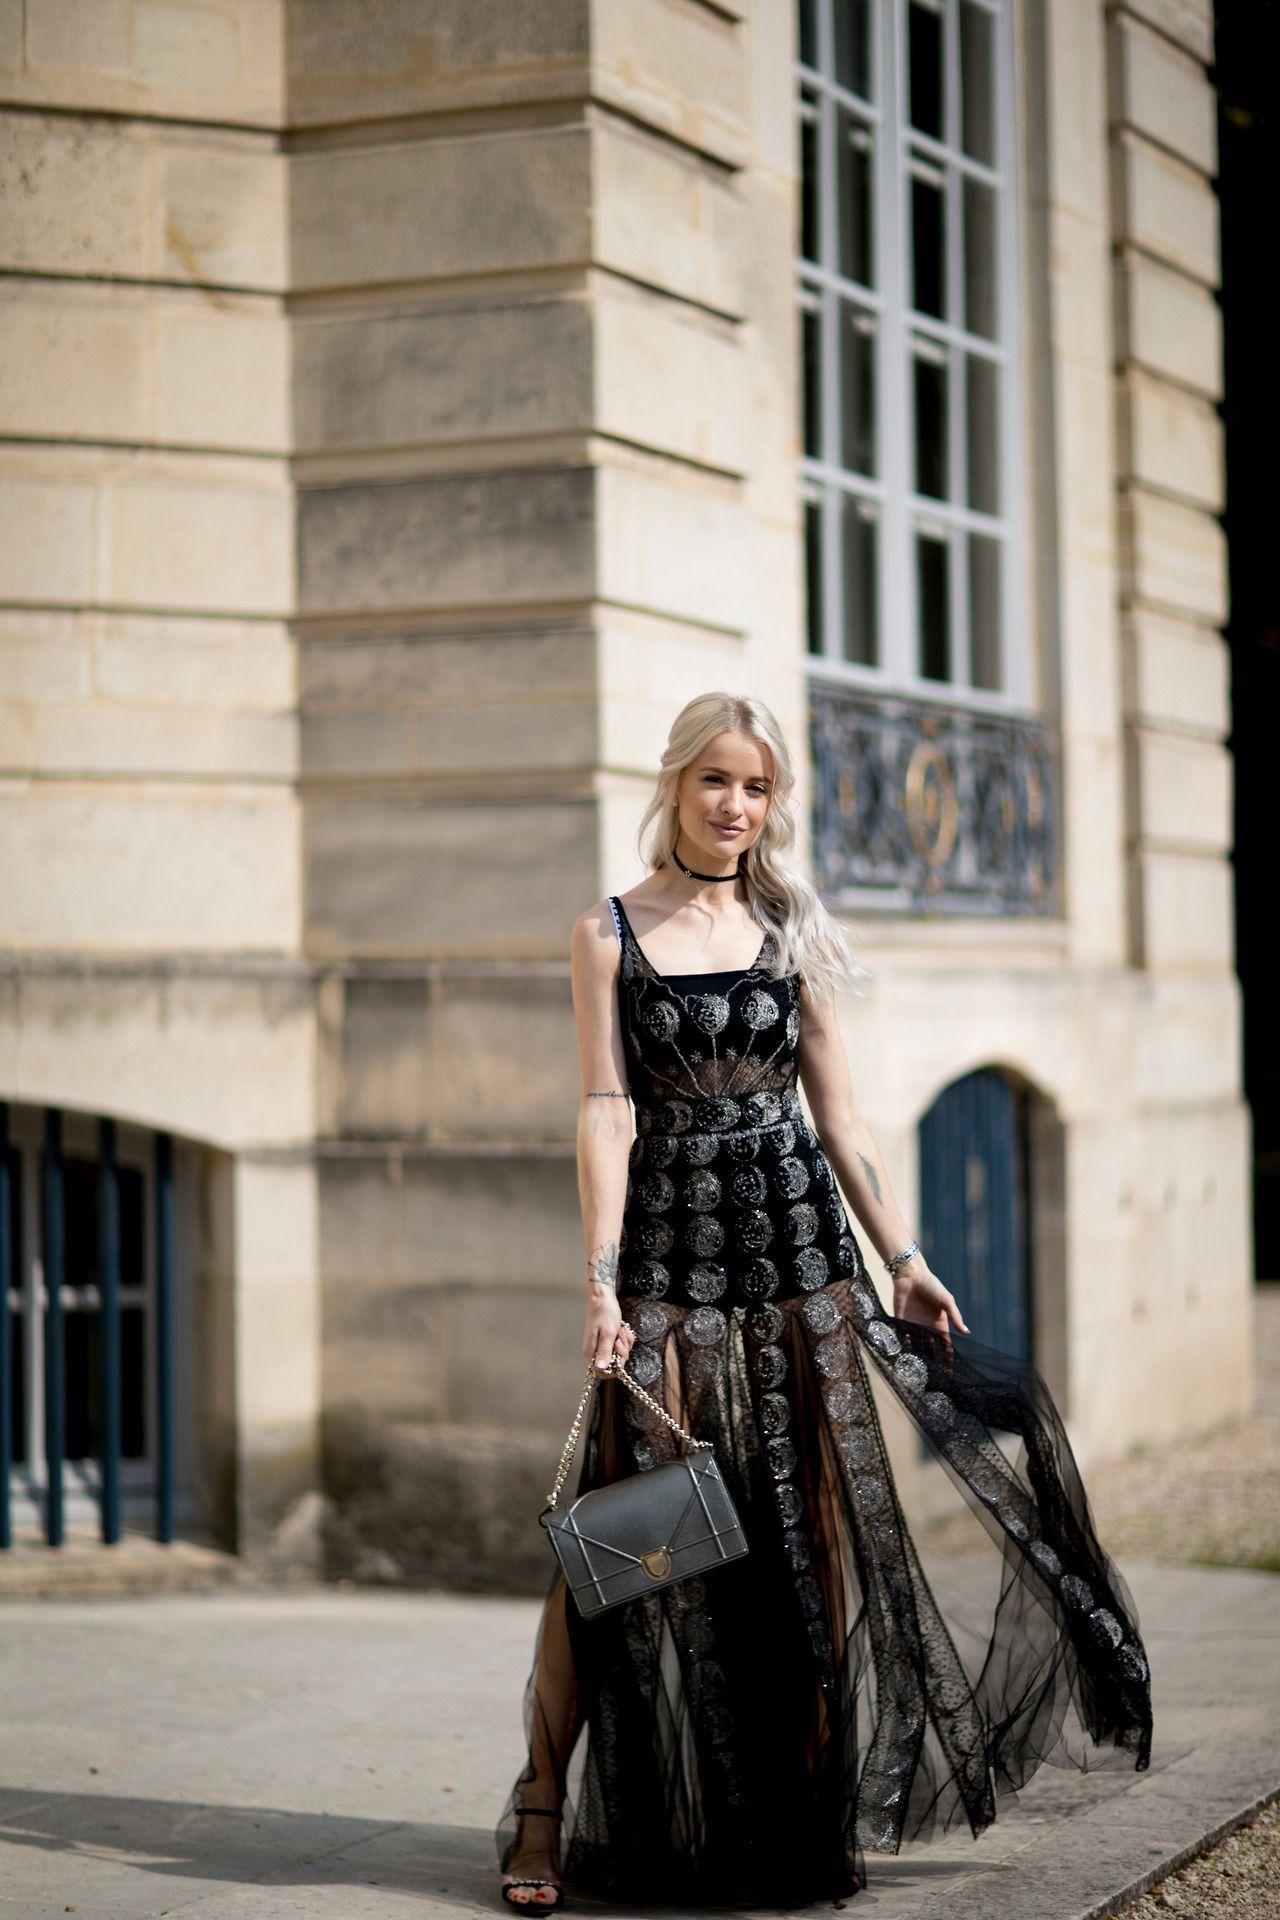 Etiket: parisde moda